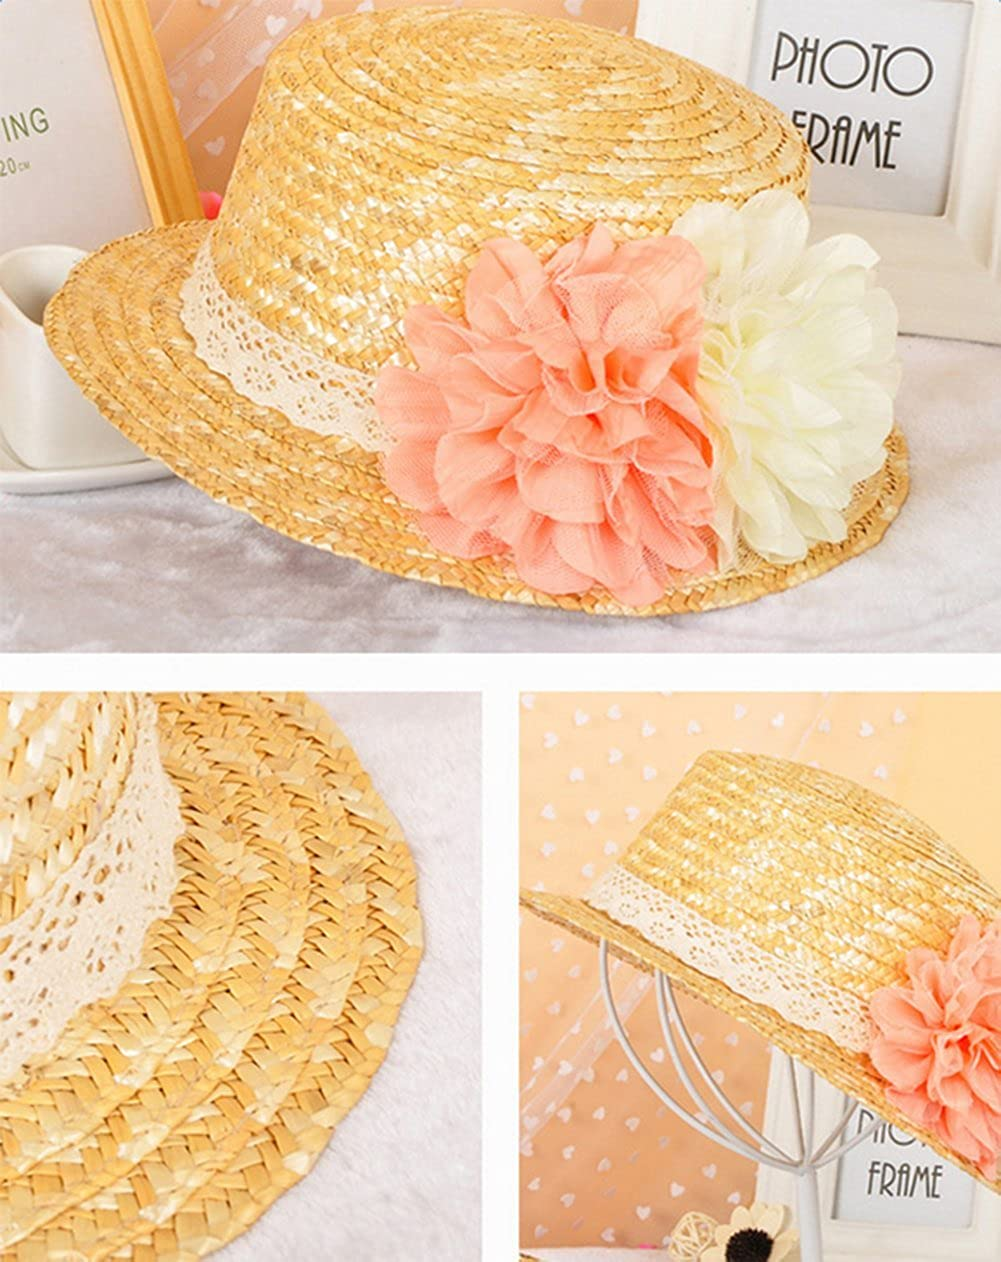 ace86f5fdc6 Cupcinu Straw Hats Summer Sun Beach Hats Flower Lace Wide Brim Wreath  Decoration Foldable Packable Cap Hats Sun Visor Anti-UV for Women Girls  Ladies  ...